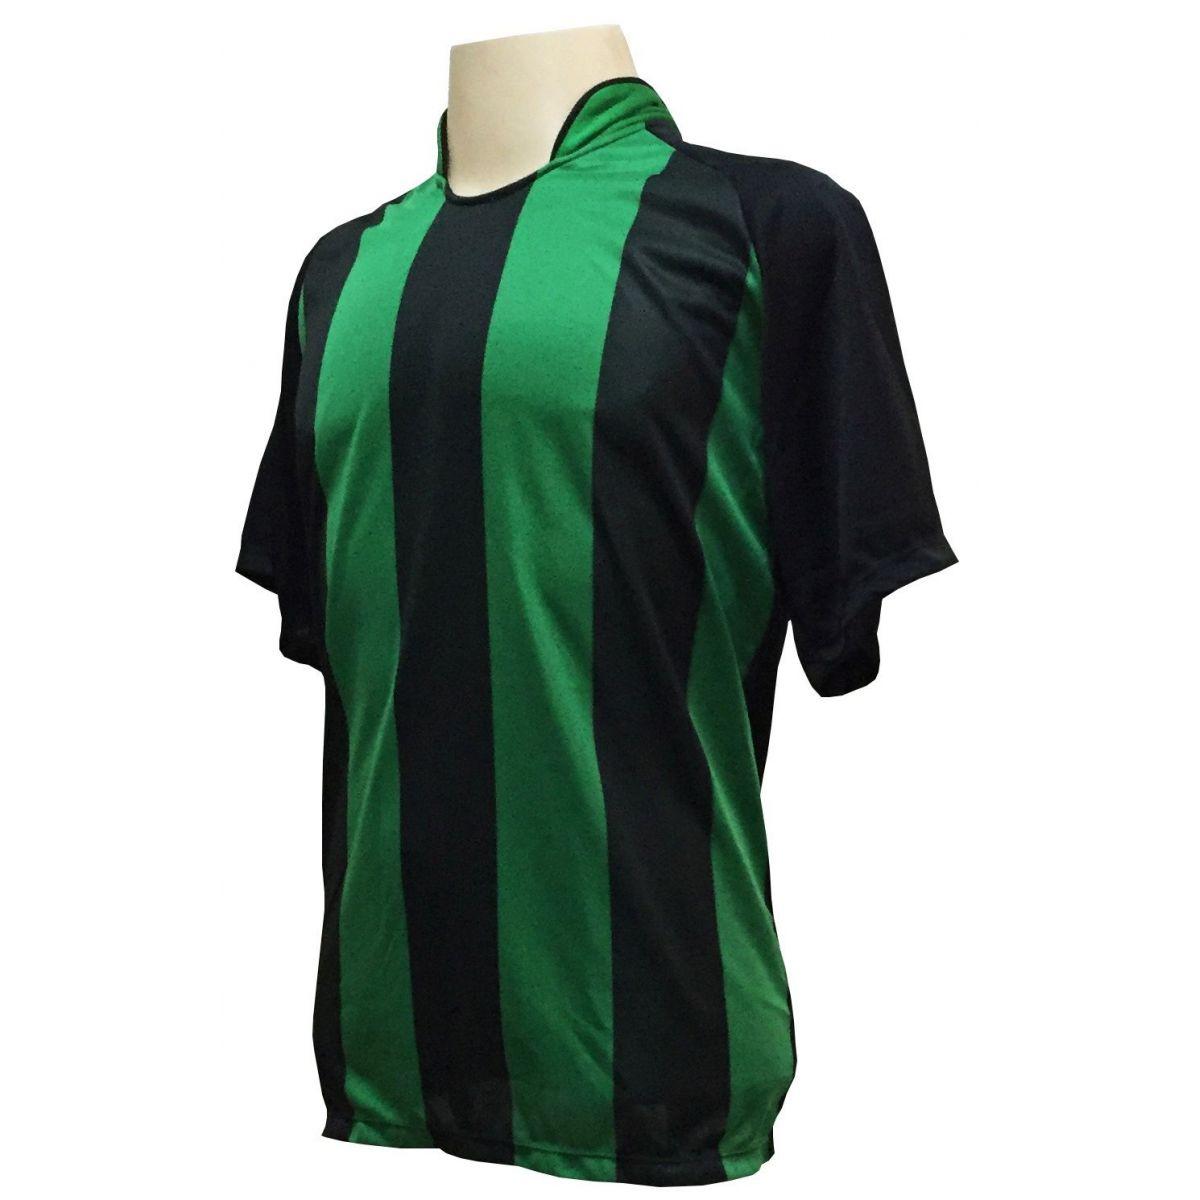 Jogo de Camisa com 12 unidades modelo Milan Preto/Verde + Brindes